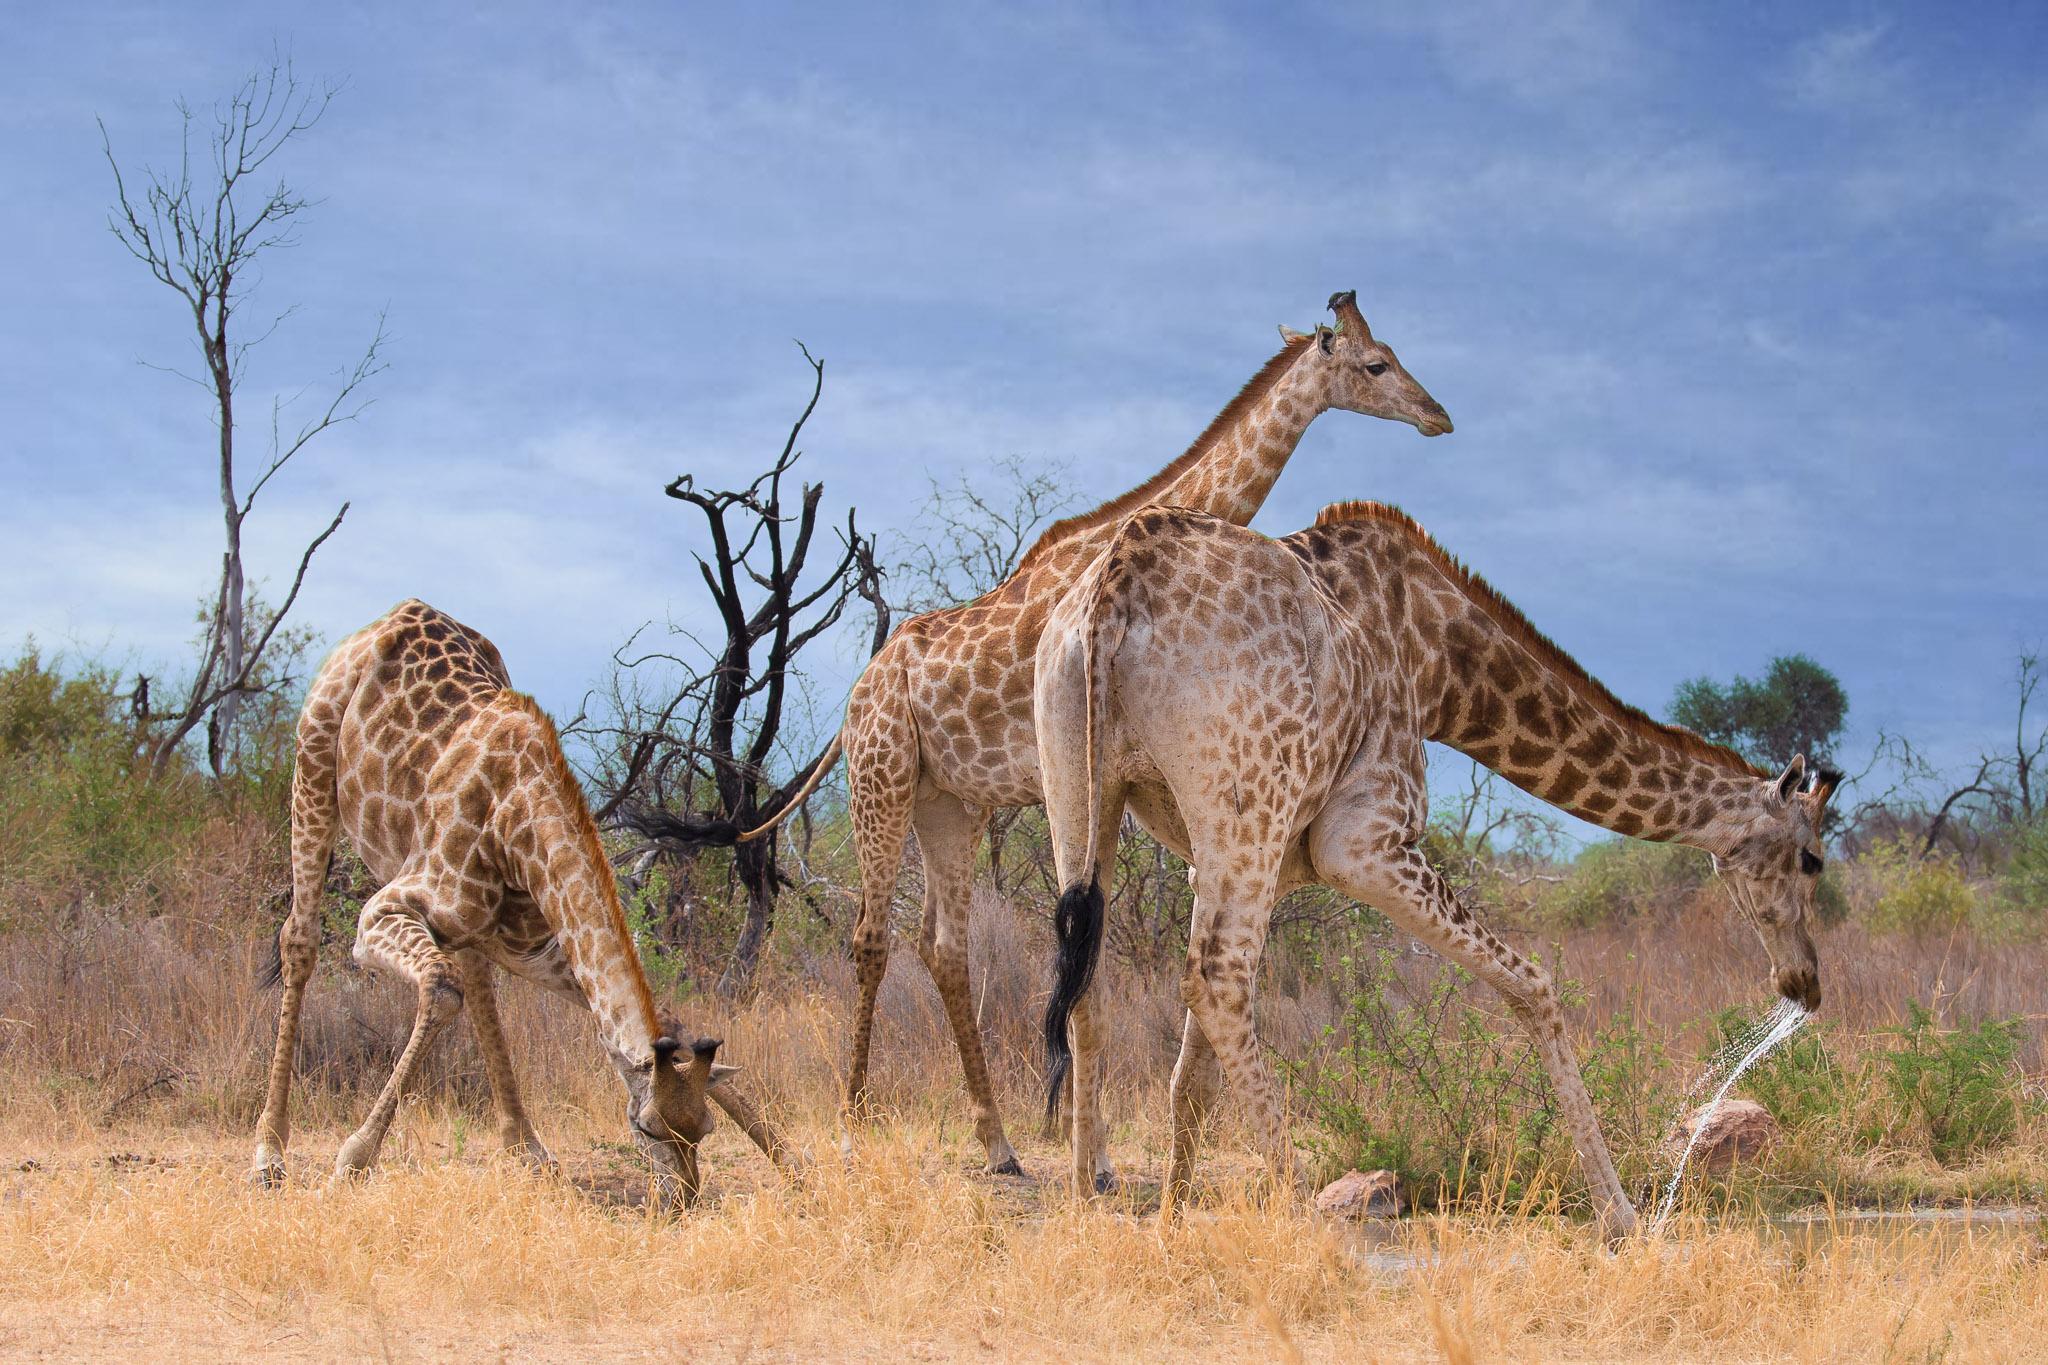 Giraffes ~Nysvley, South Africa